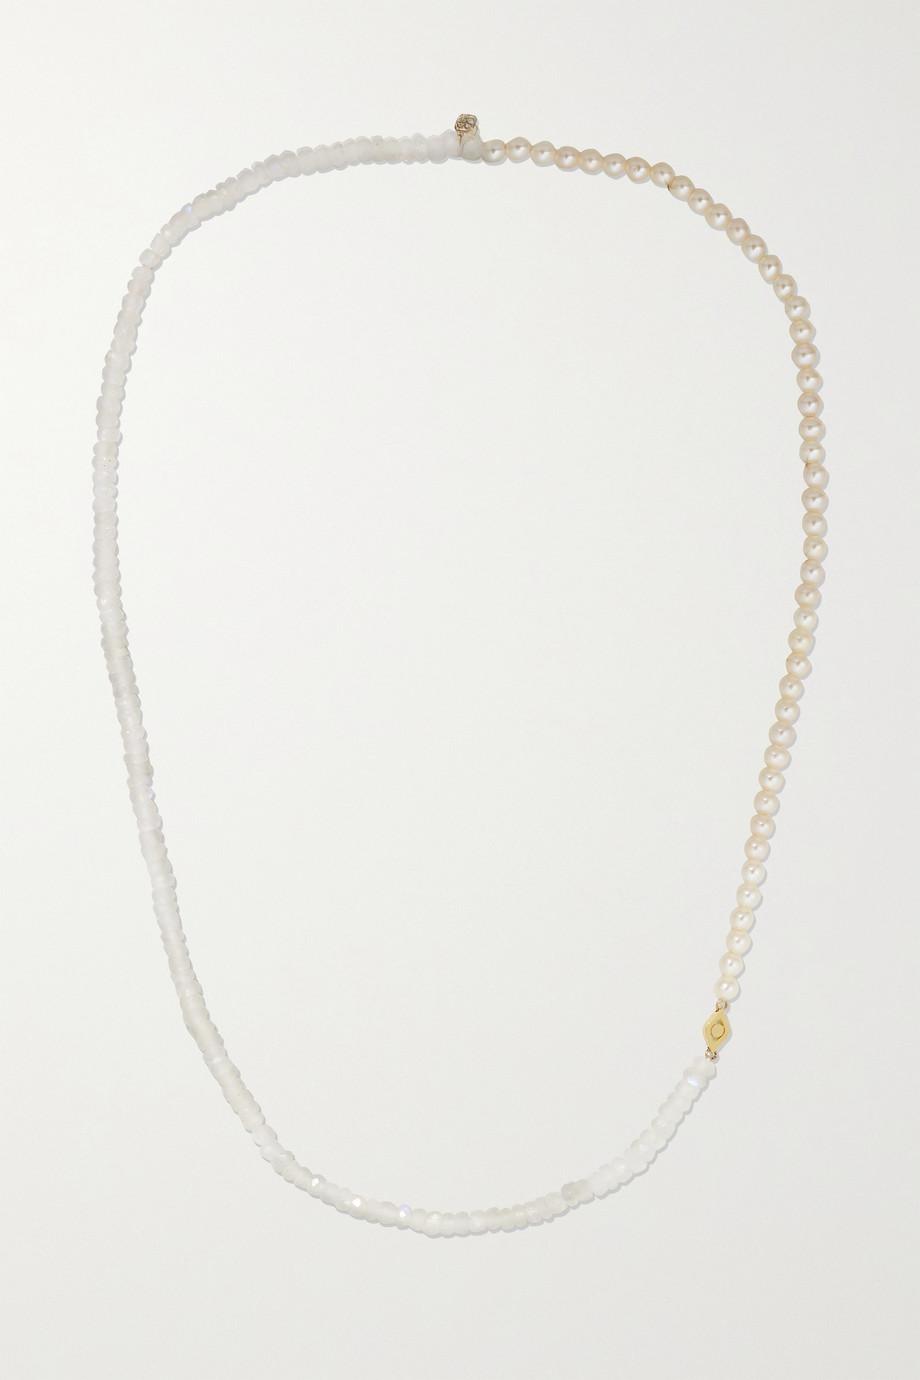 Sydney Evan Collier en or 14 carats, pierres de lune et perles